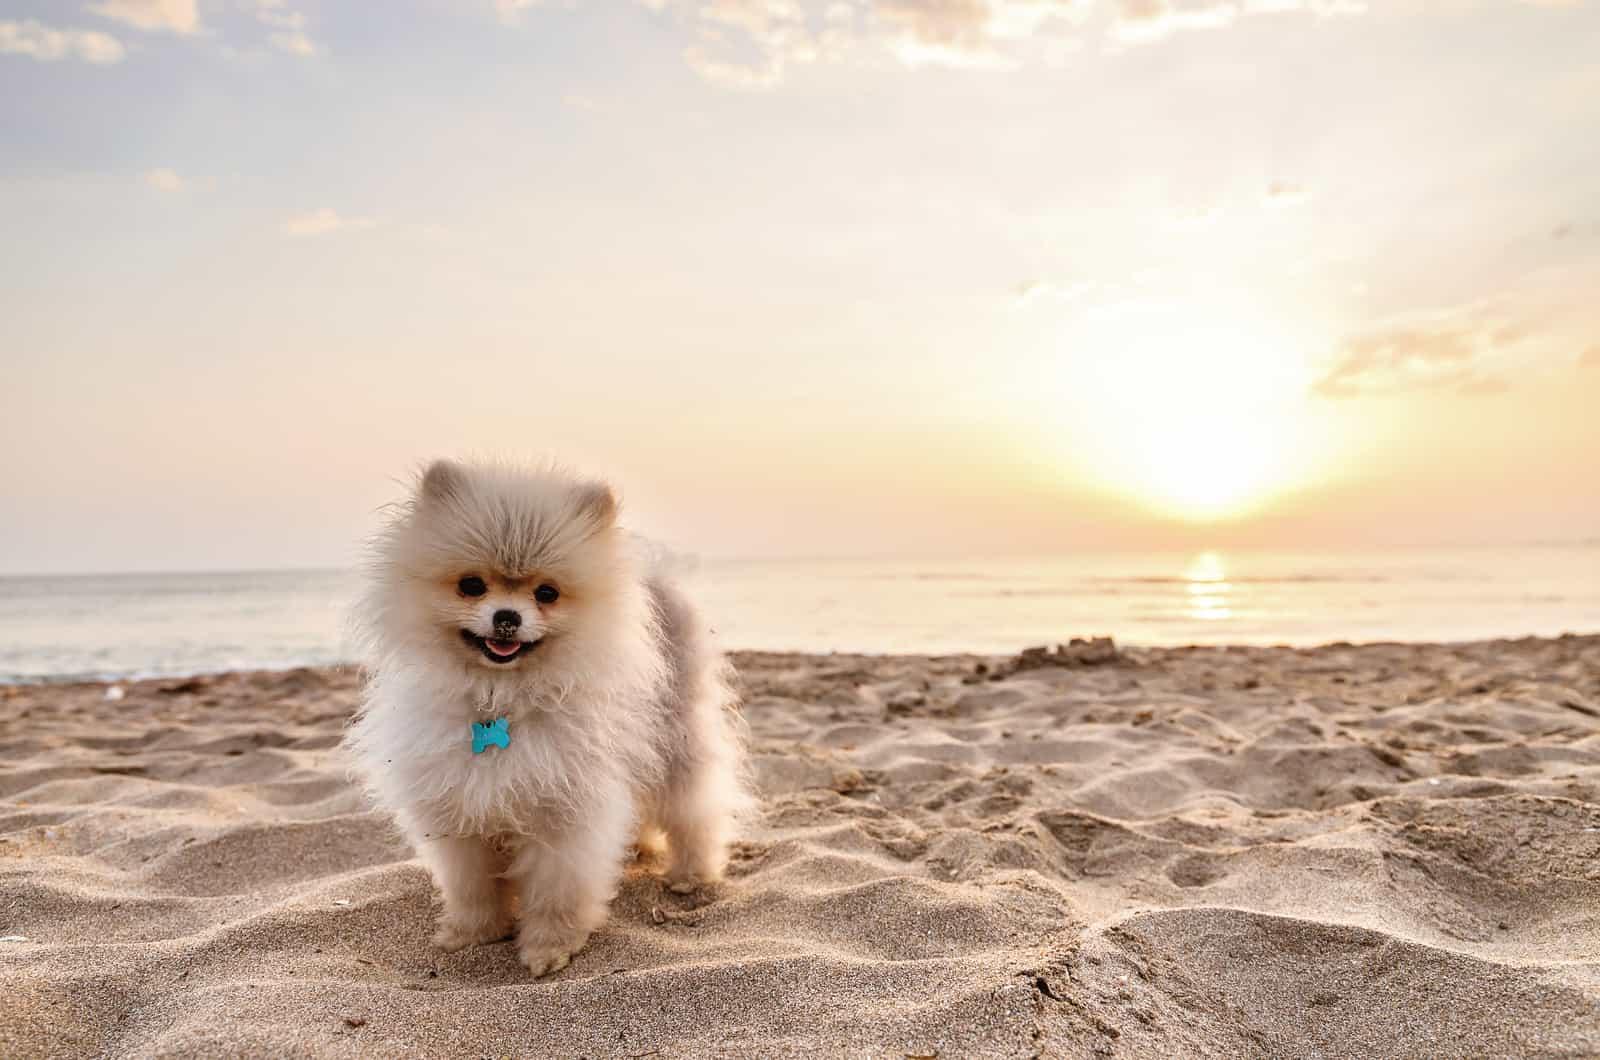 pomeranian at a sandy beach